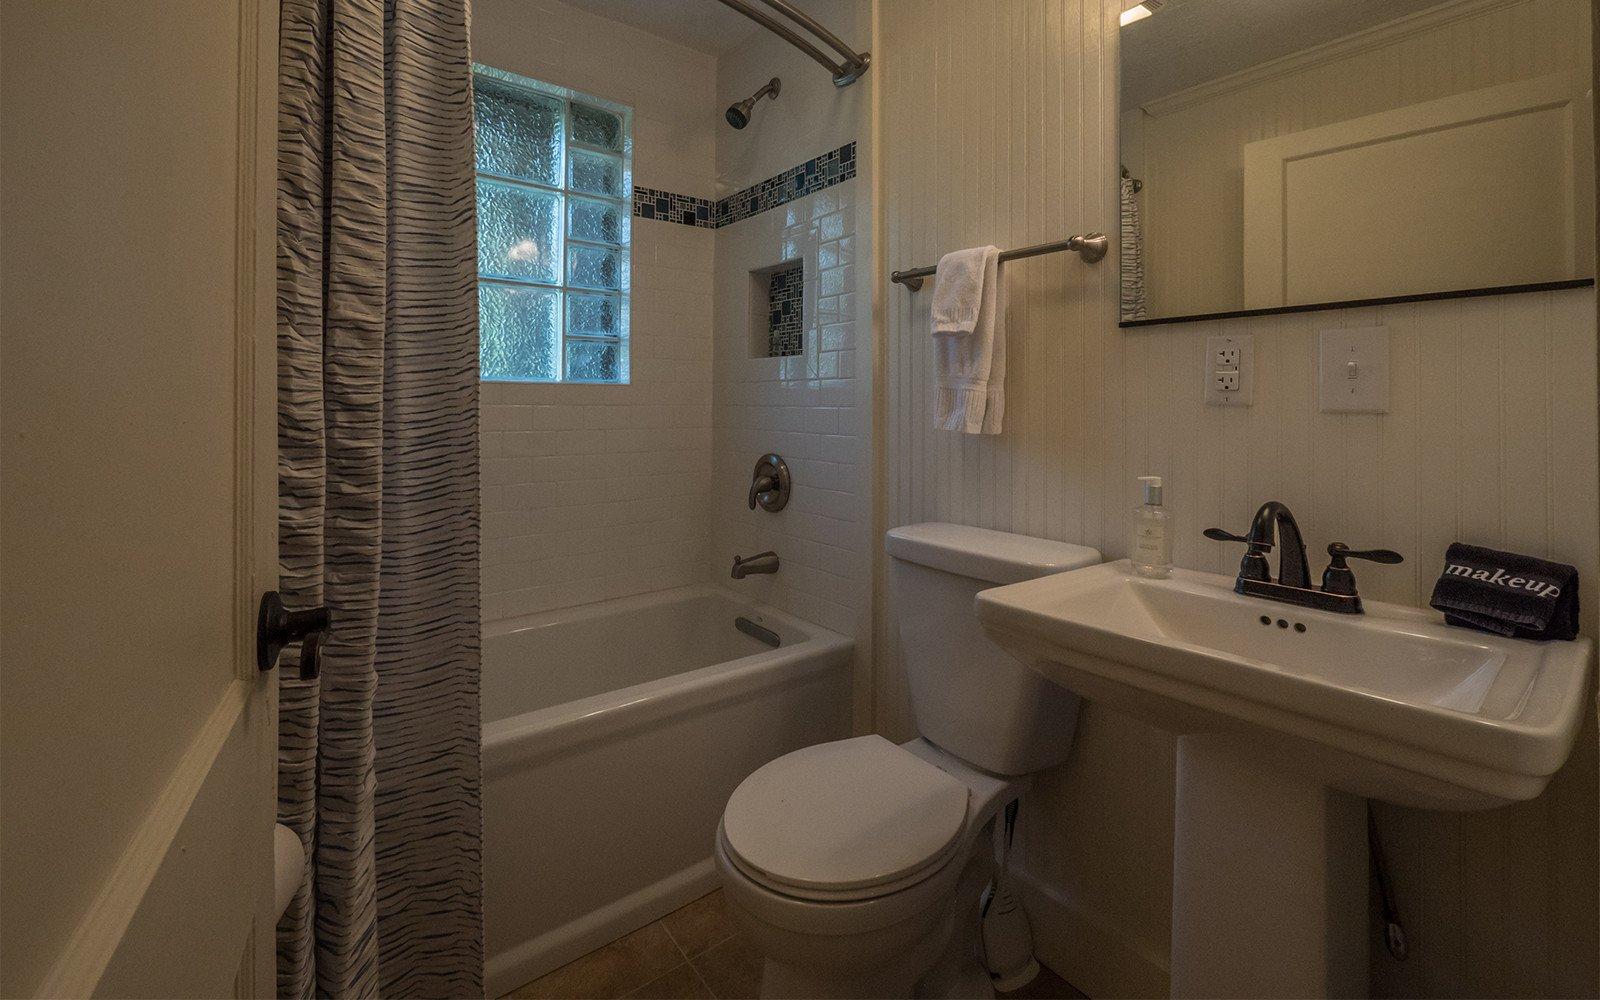 Guest-house-bathroom-2